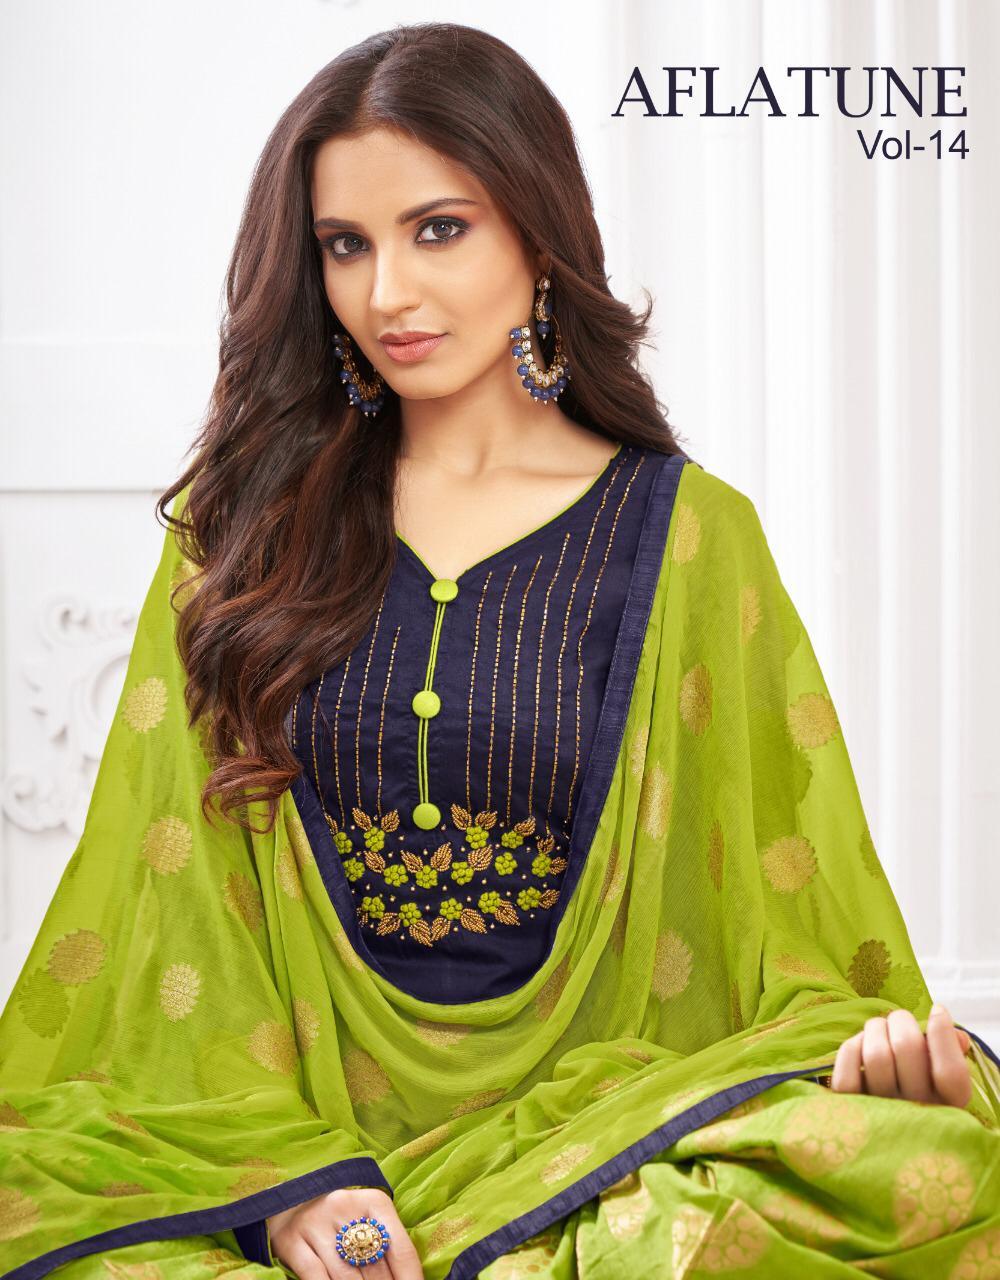 Kapil Trendz Aflatune Vol 14 Salwar Suit Wholesale Catalog 12 Pcs 2 - Kapil Trendz Aflatune Vol 14 Salwar Suit Wholesale Catalog 12 Pcs